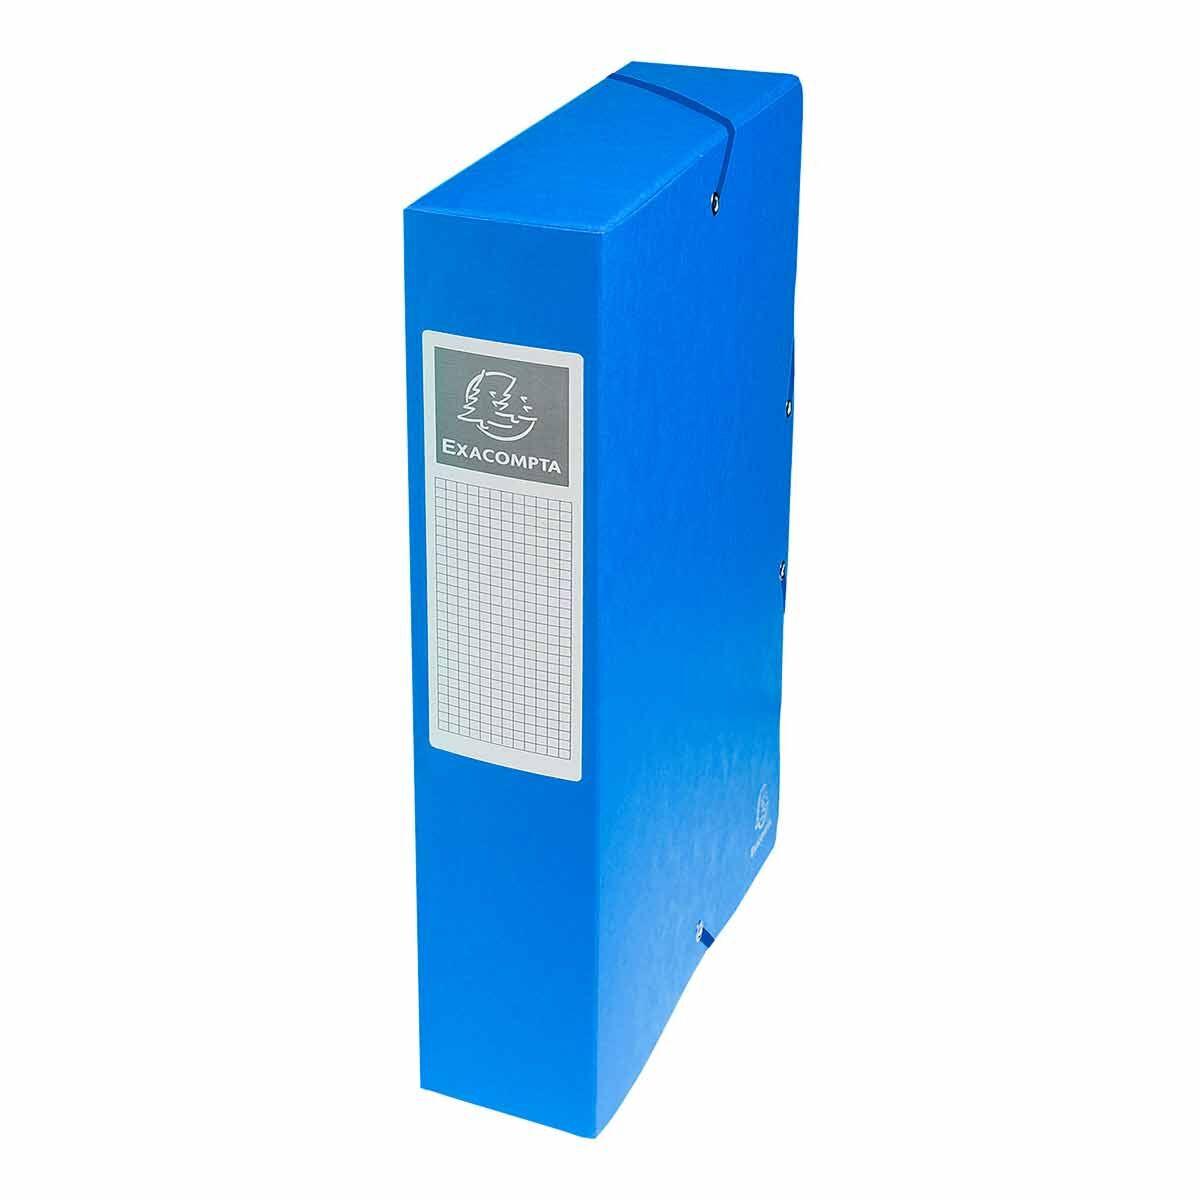 Exacompta Elasticated Box File Pressboard A4 60mm Pack of 8 Blue